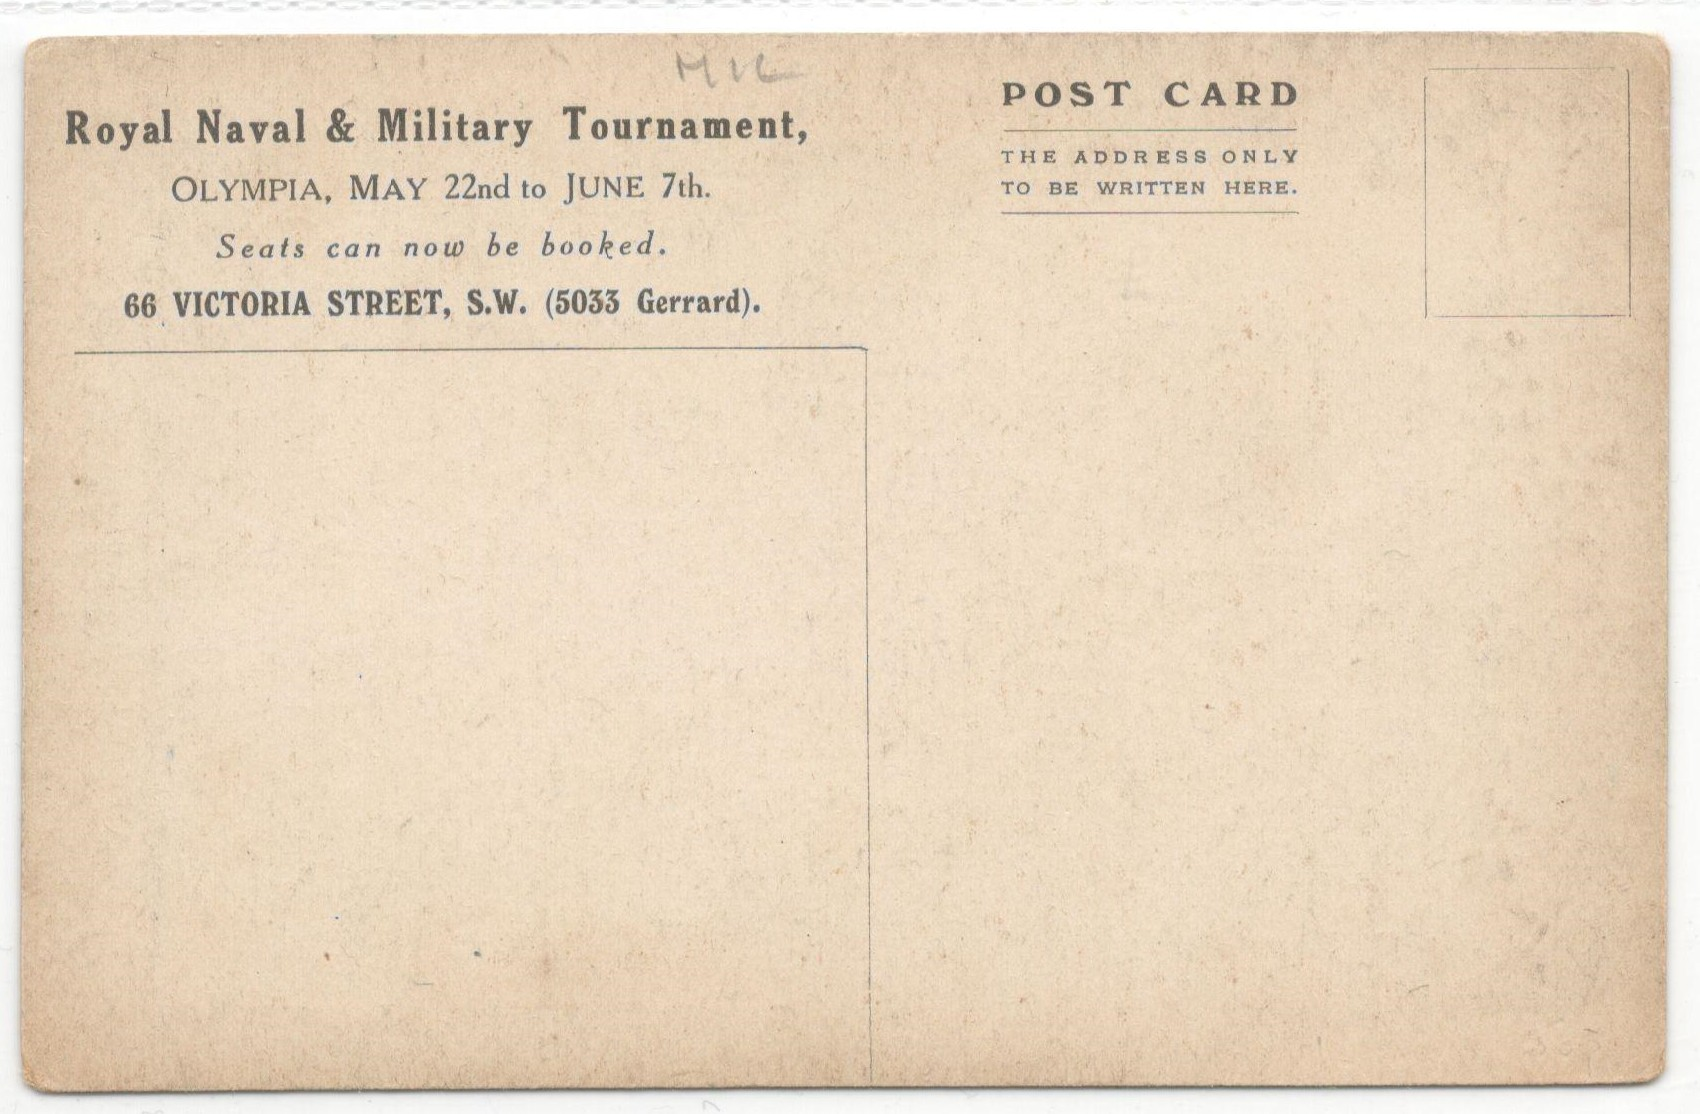 1920 ROYAL NAVAL & MILITARY TOURNAMENT POSTCARD - Image 2 of 2